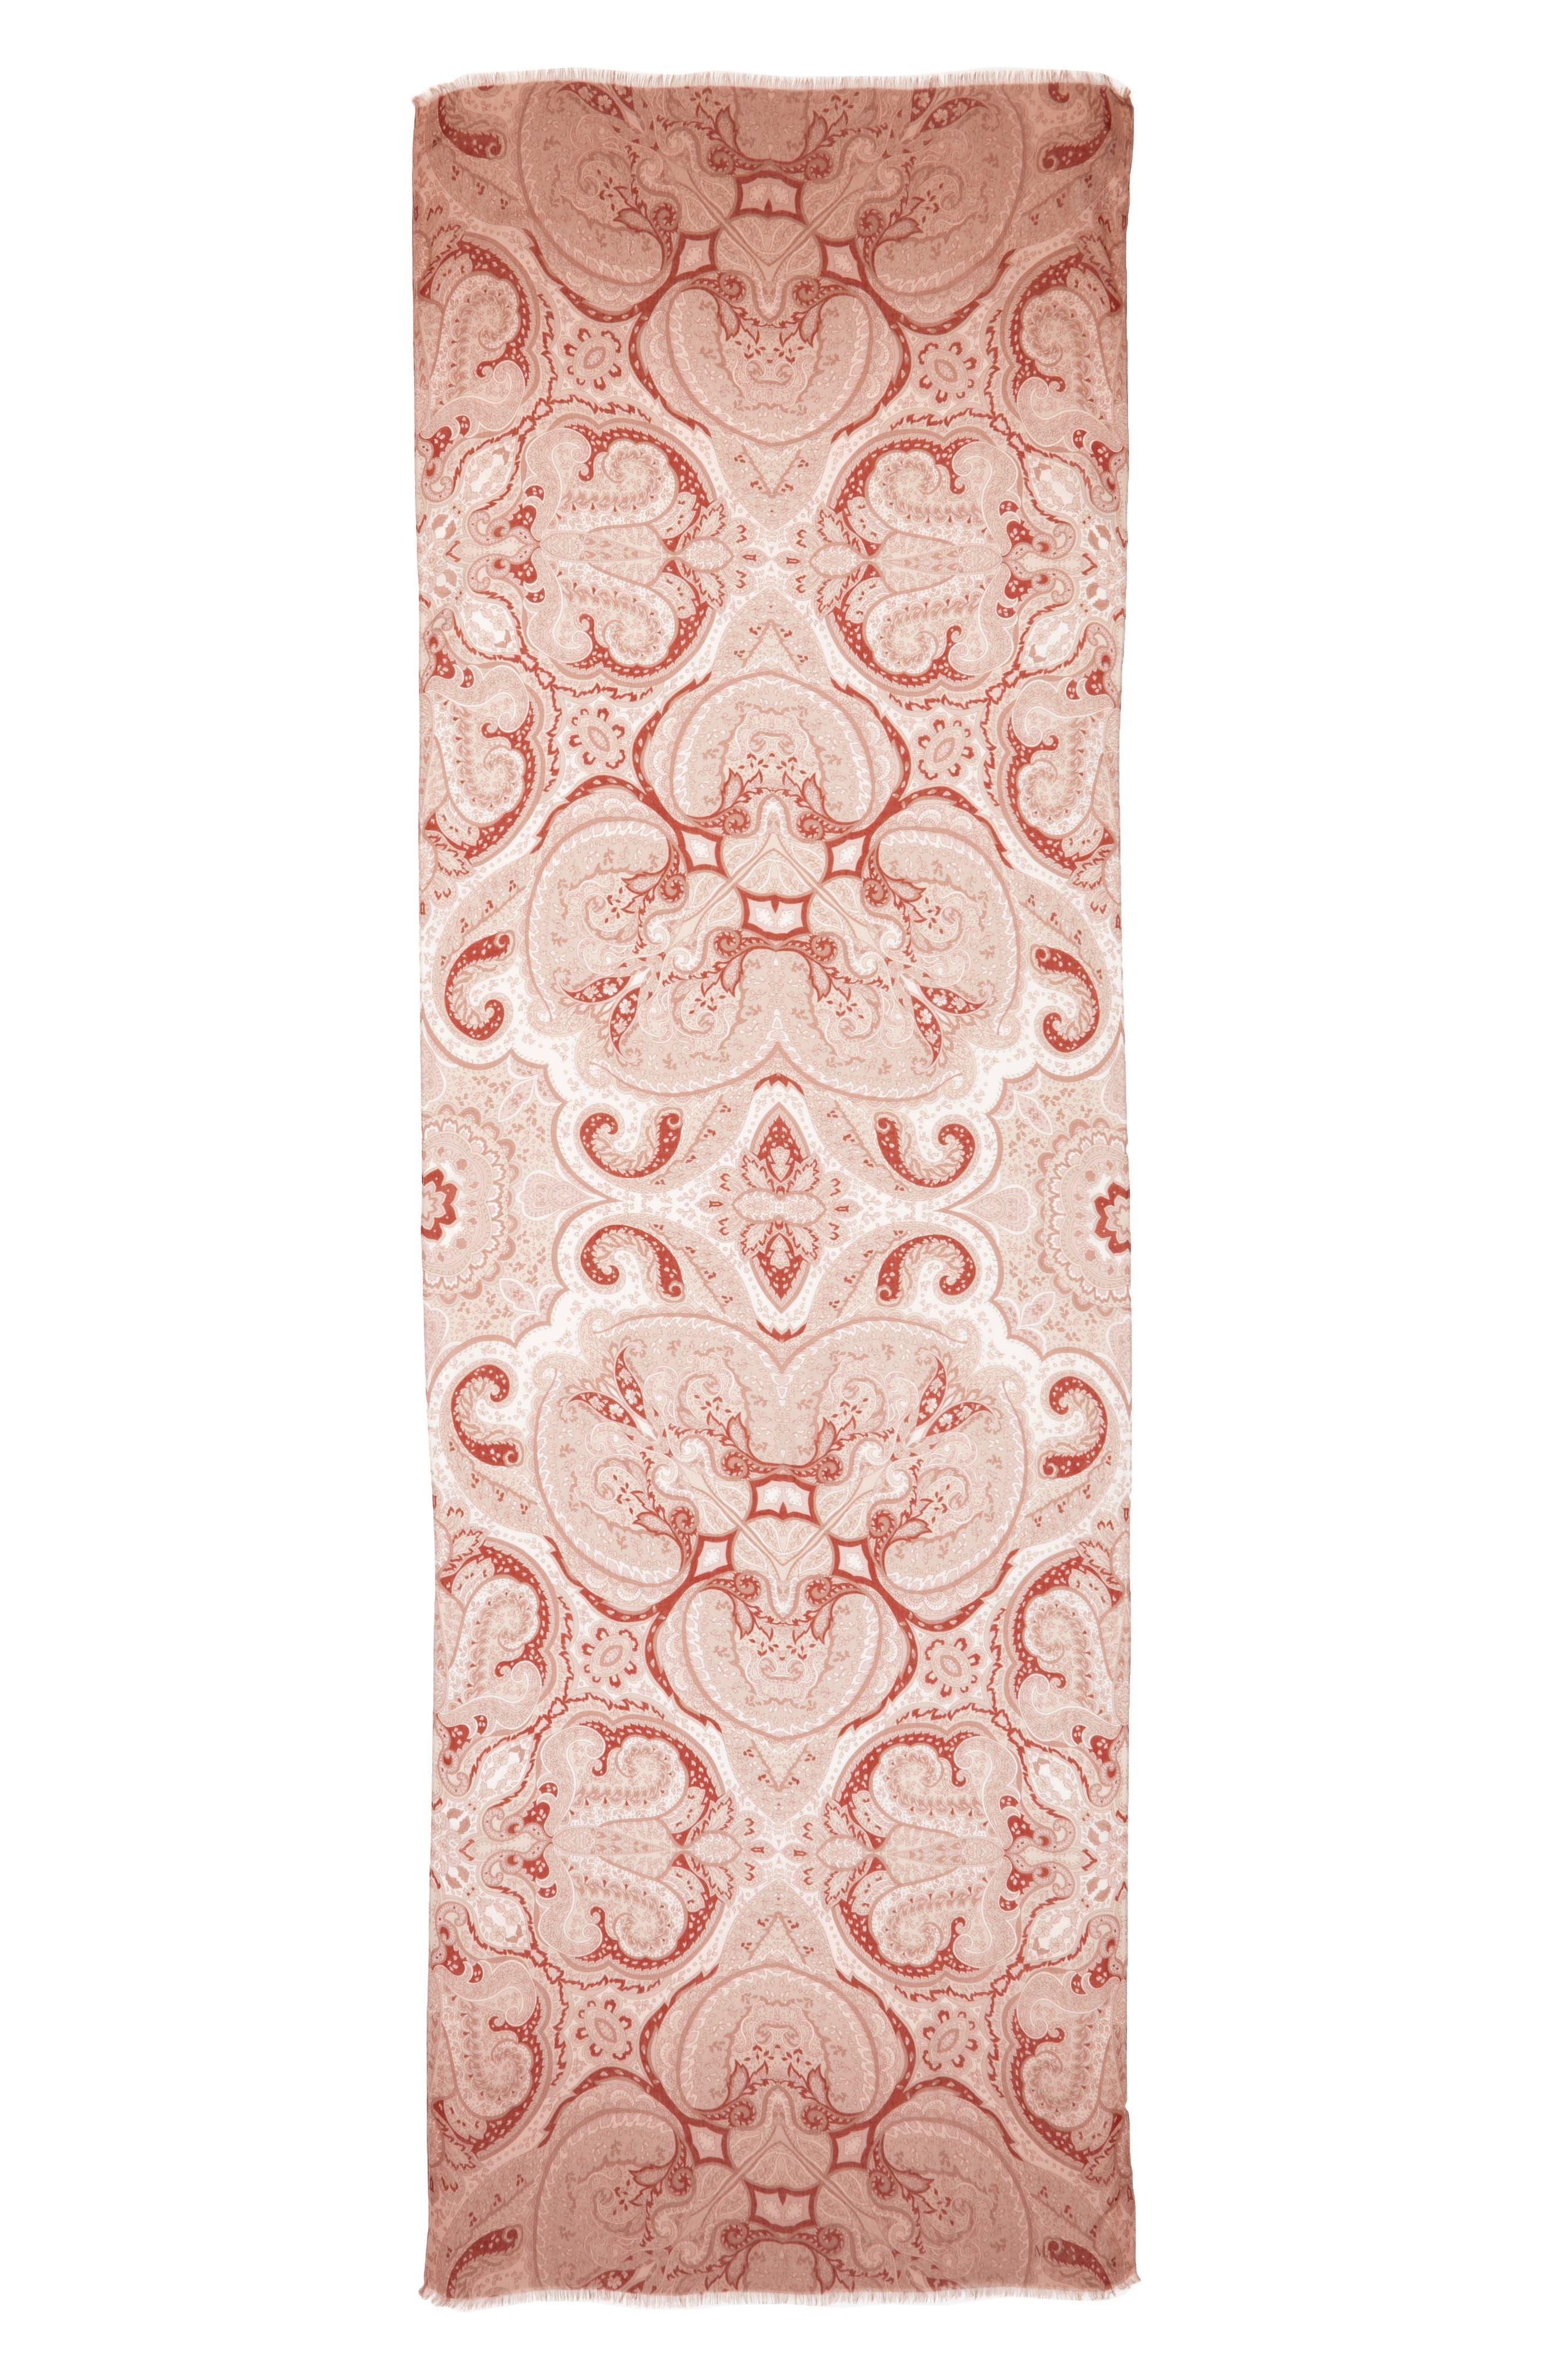 Max Mara Carella Paisley Print Modal & Cashmere Scarf